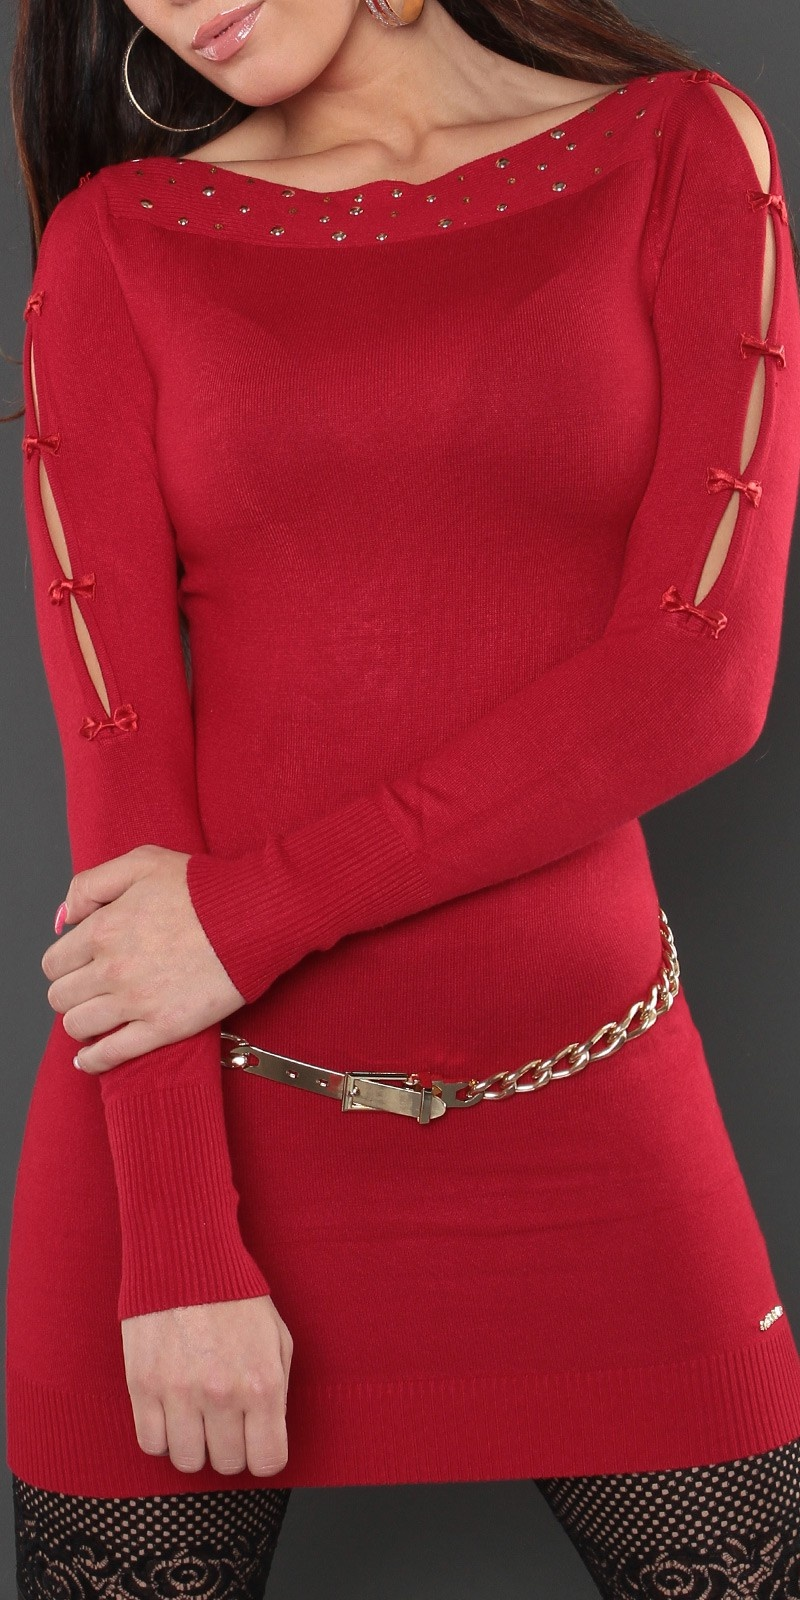 Sexy lange sweater-trui met strikjes rood